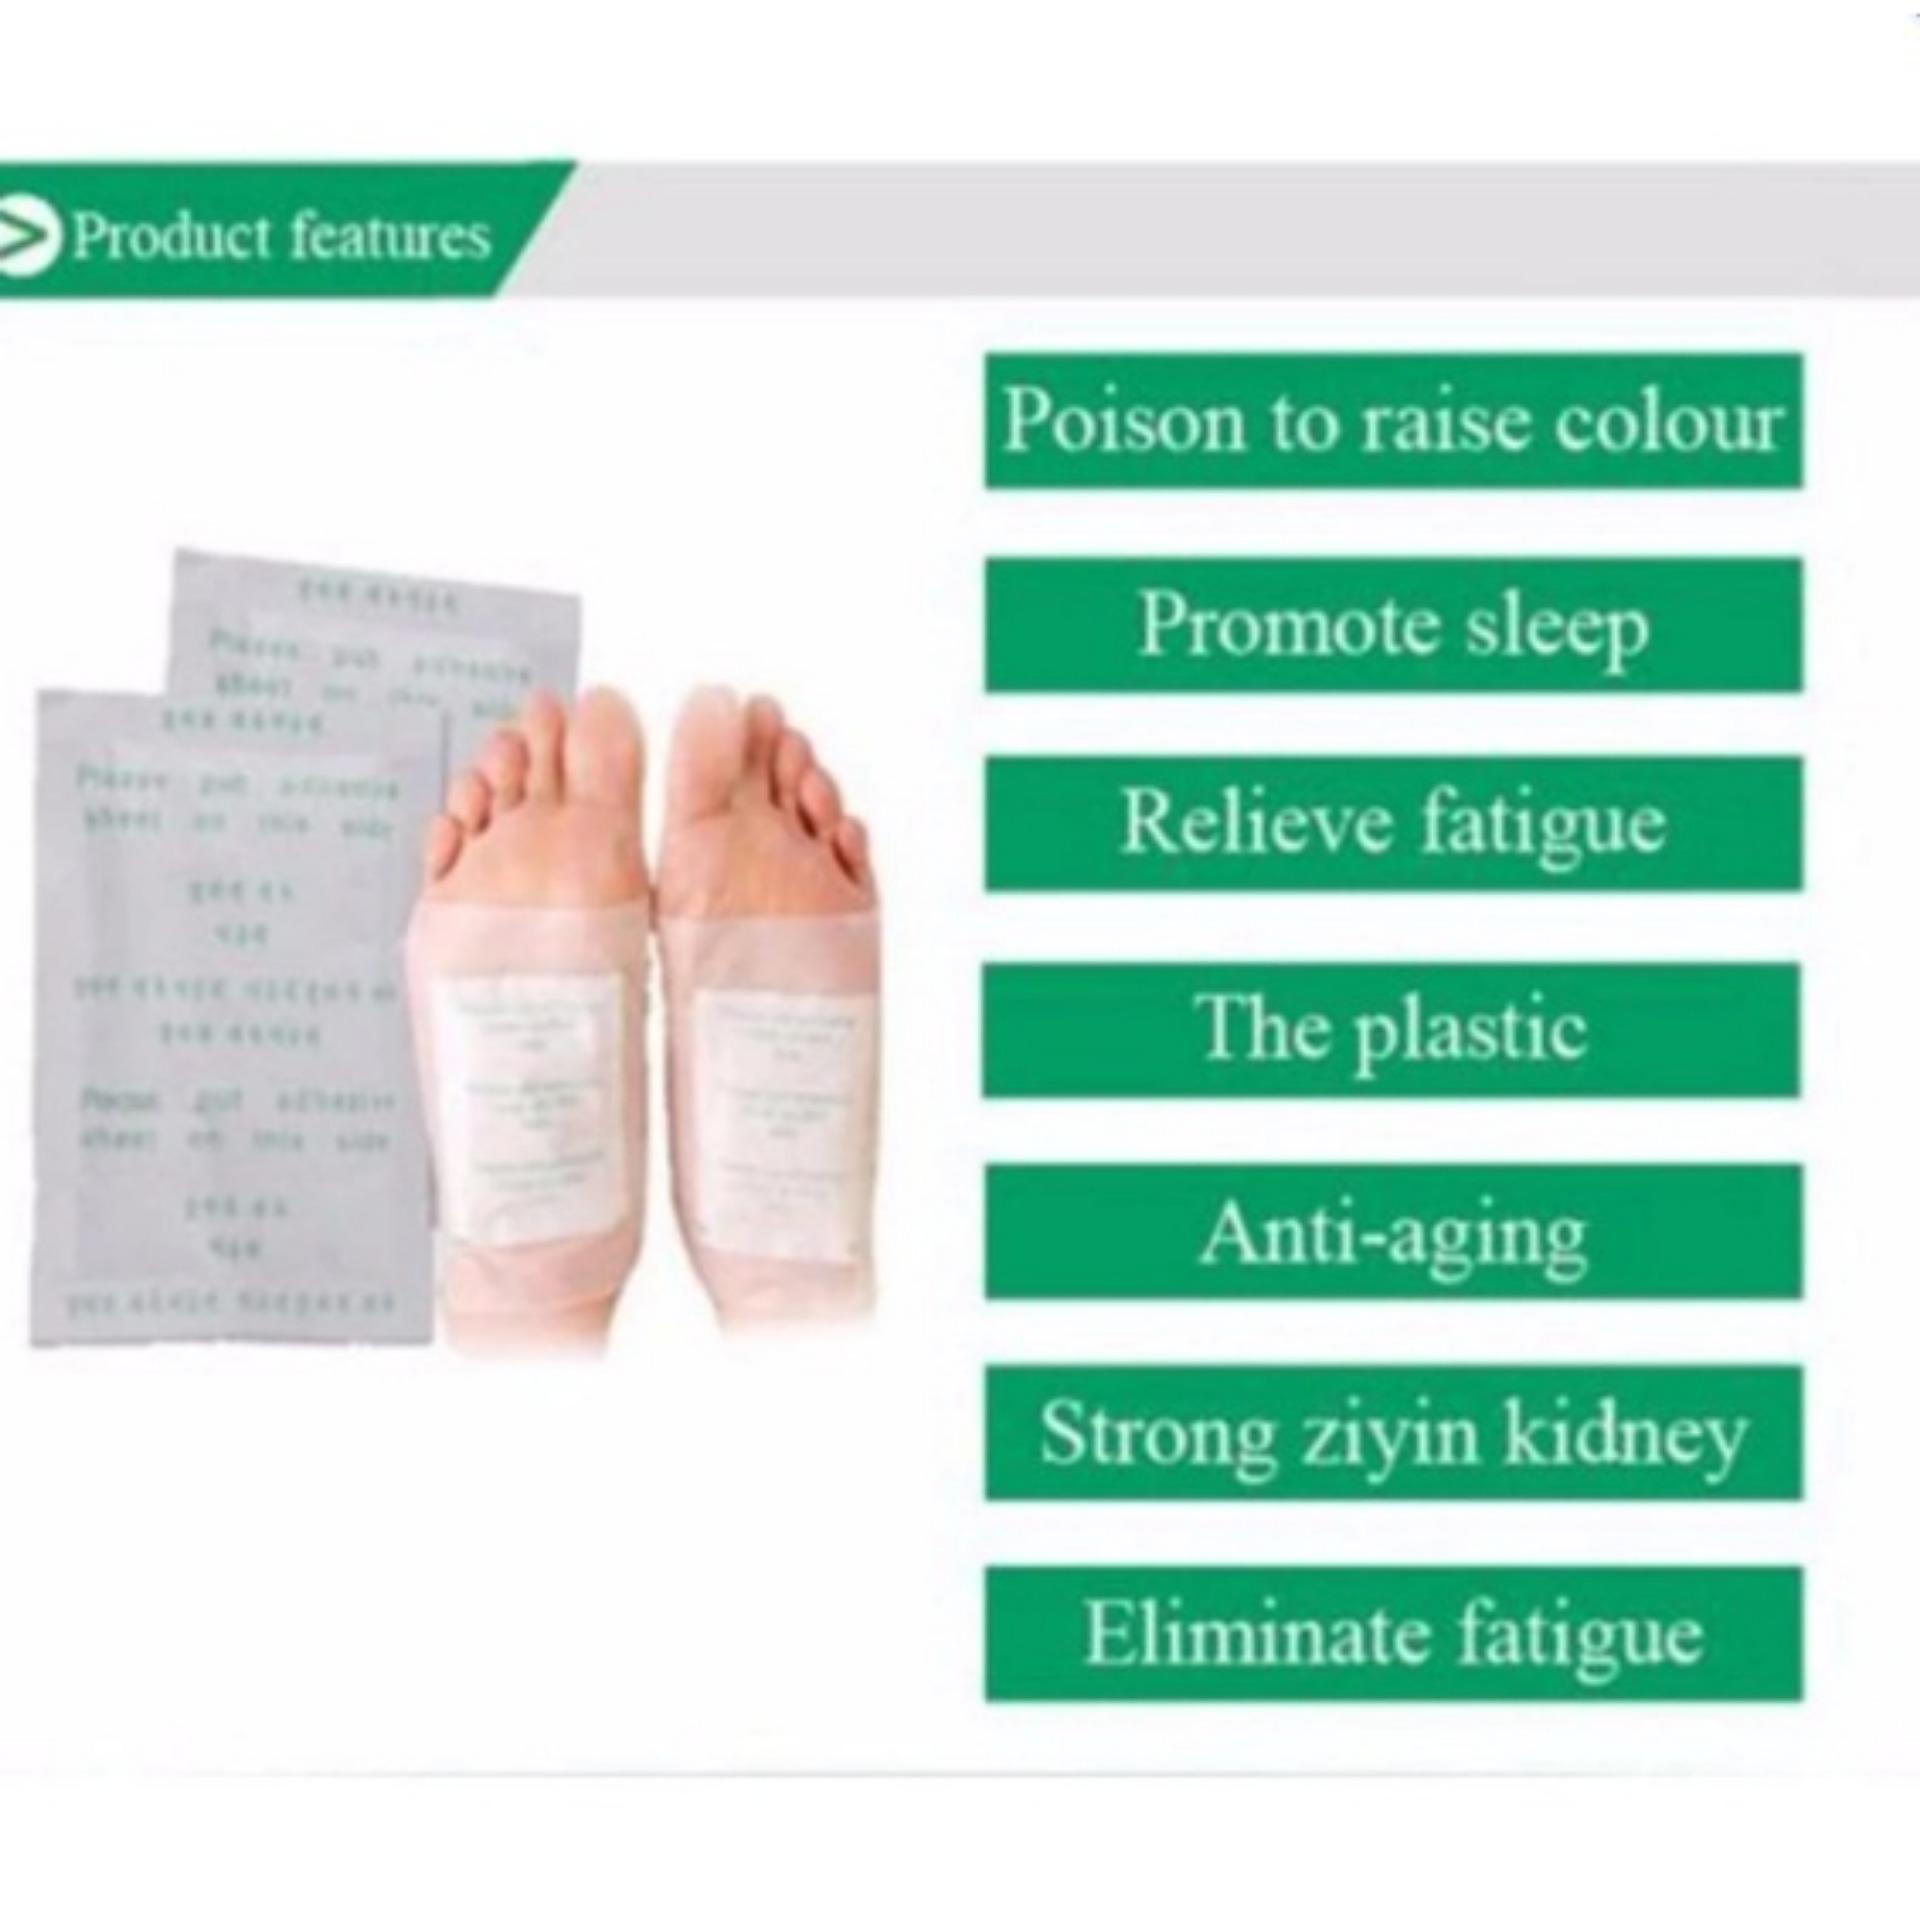 Harga Dan Spek Kinoki Update 2018 Nicotine Nicvape 100mg Per Ml 100ml Repack Philippines 10 Pads Detox Foot Organic Herbal Cleansing Patches 99g